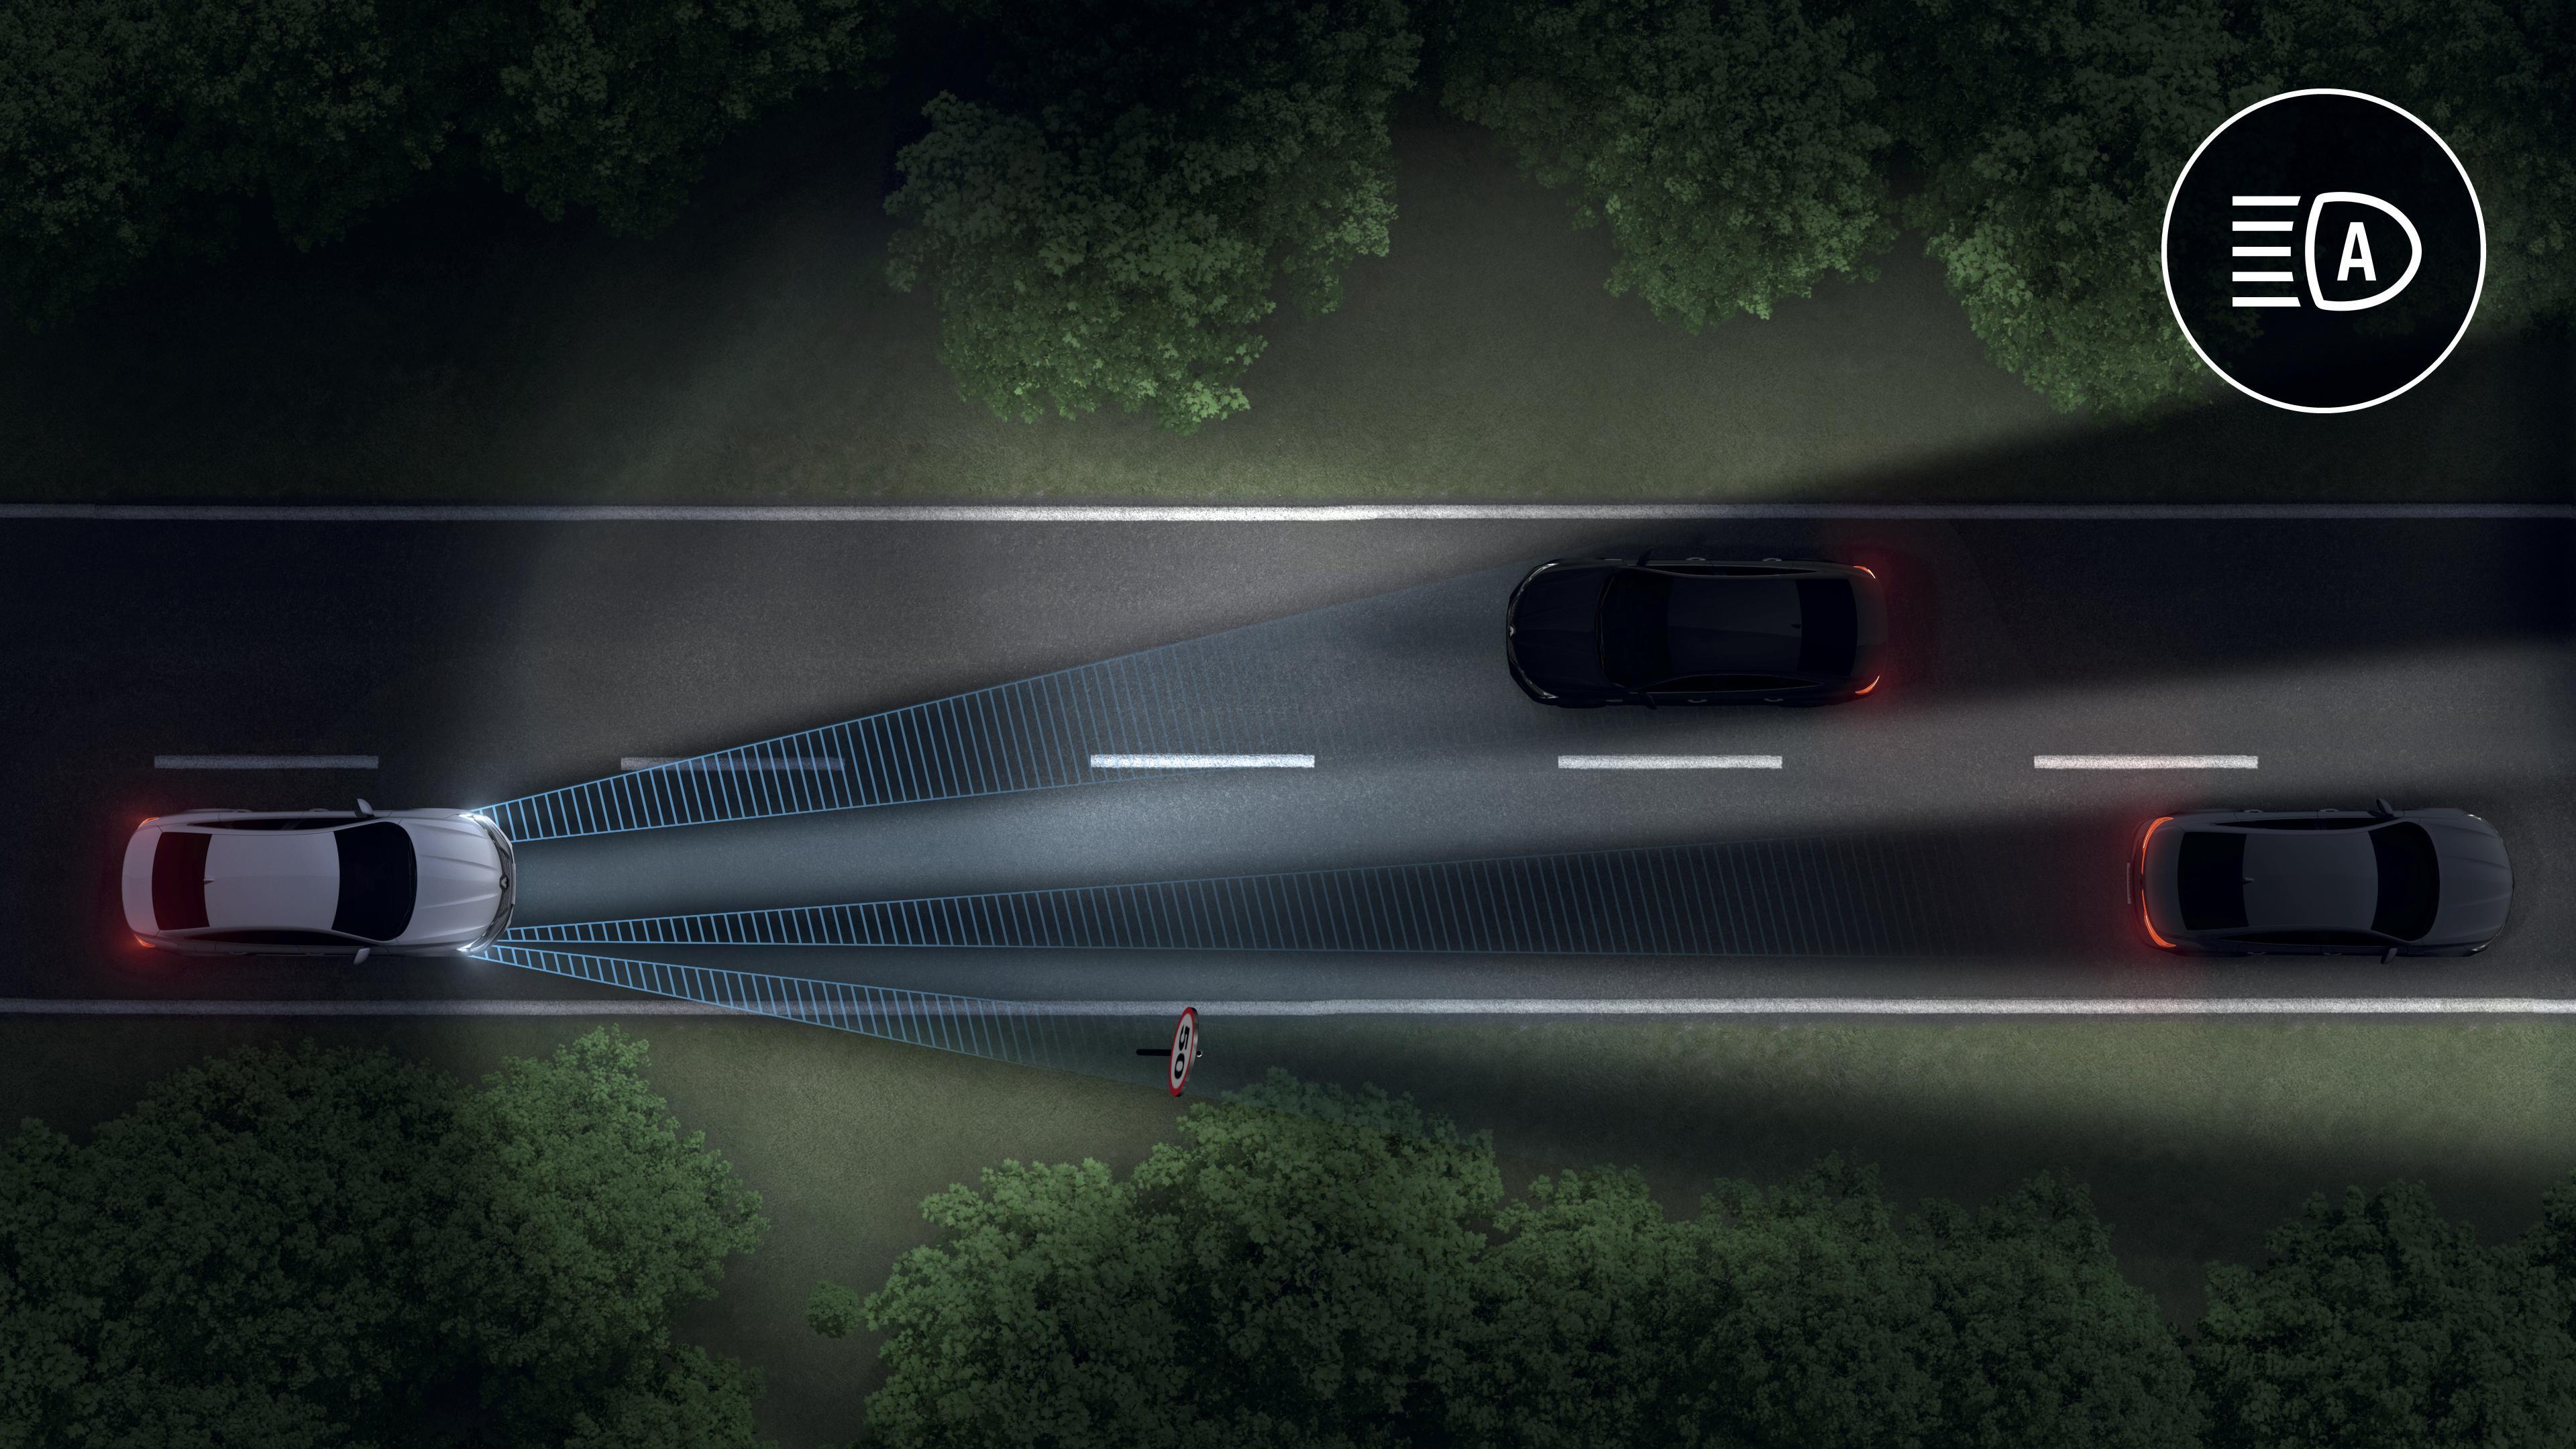 Adaptives Fernlicht LED Matrix Vision